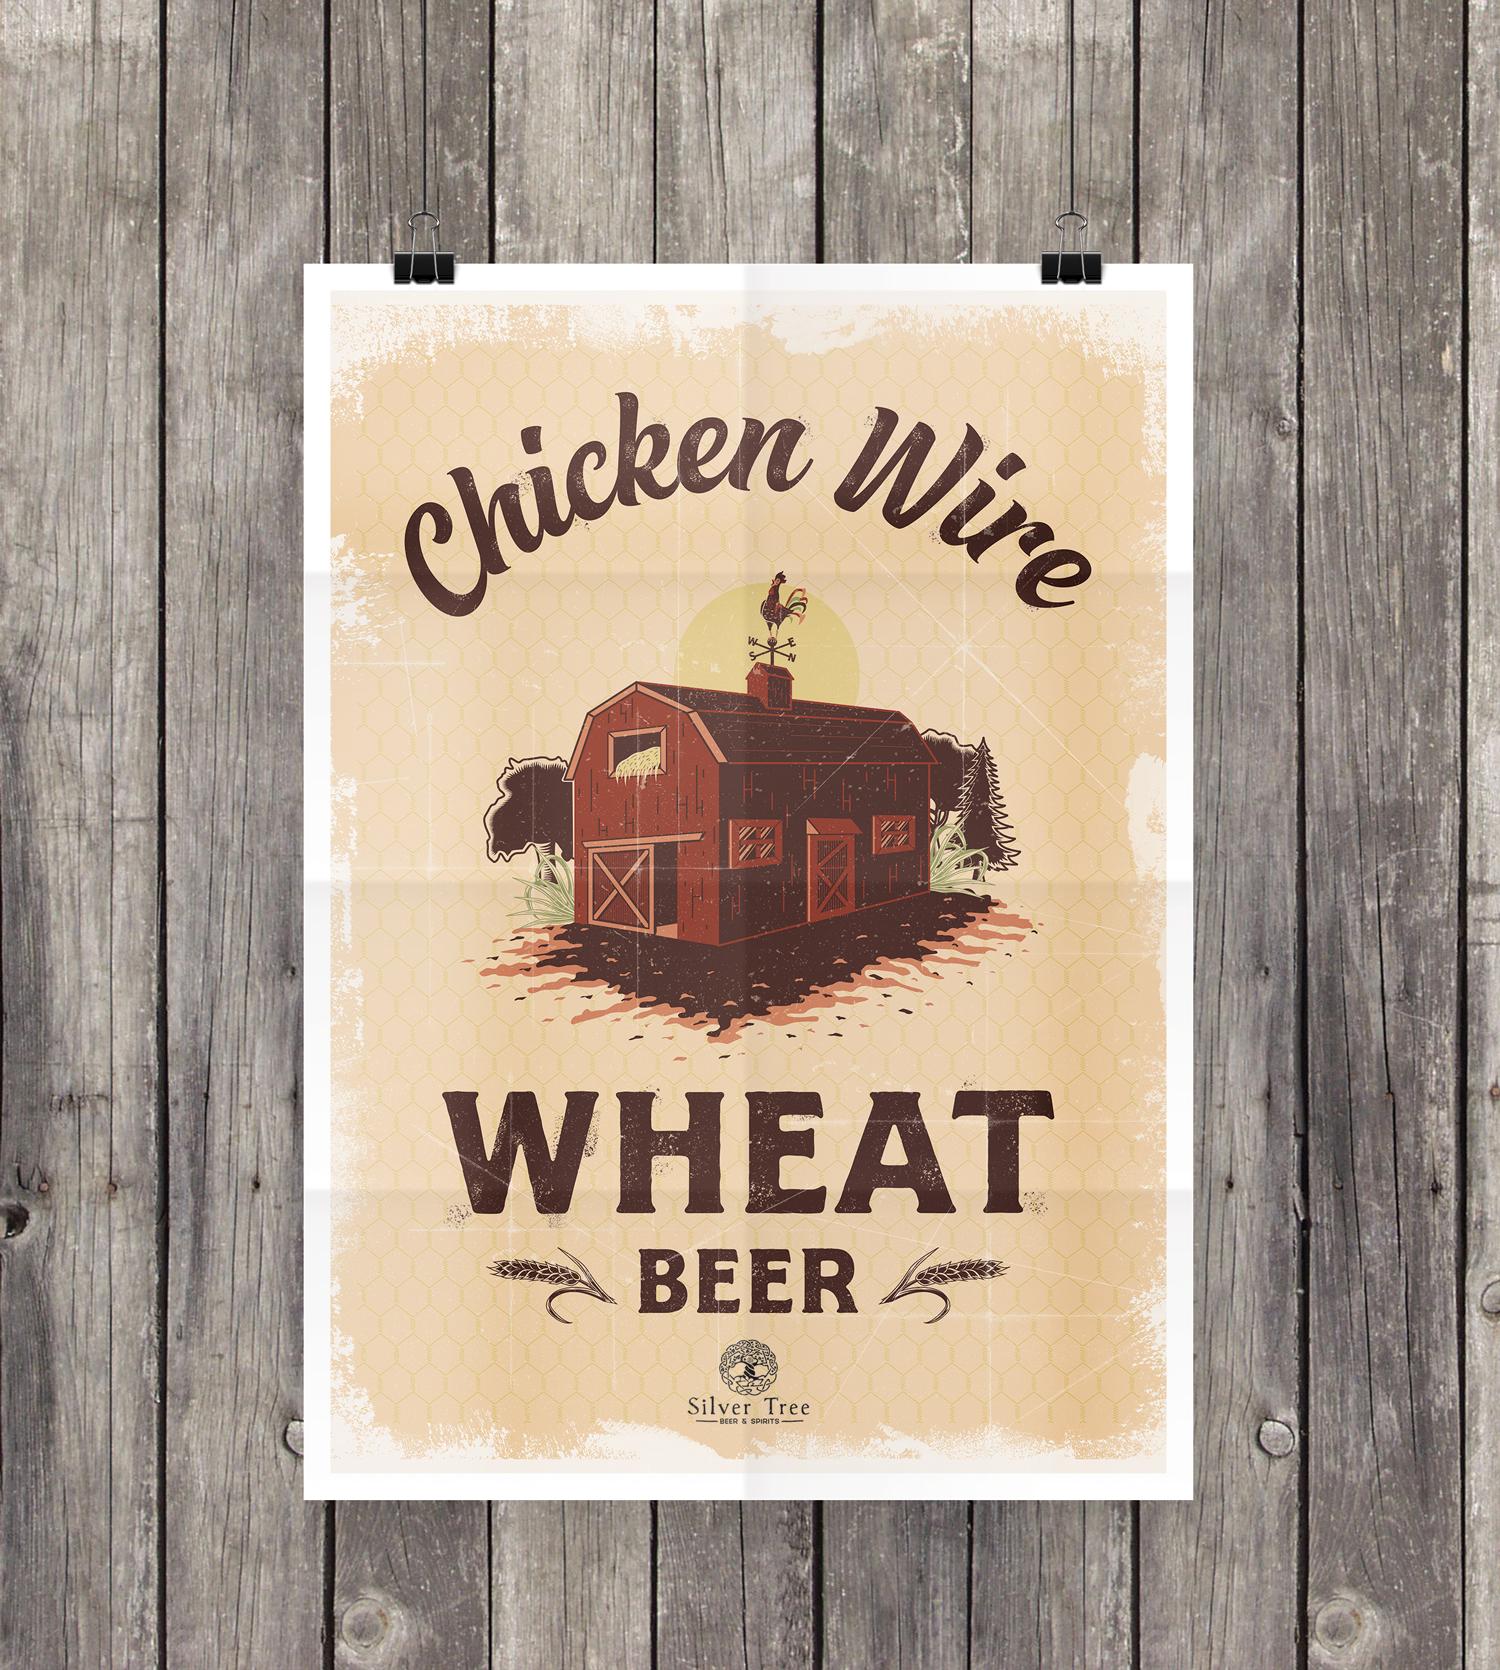 STB&S_ChickenWirePoster_MockupOnWood_1500.jpg